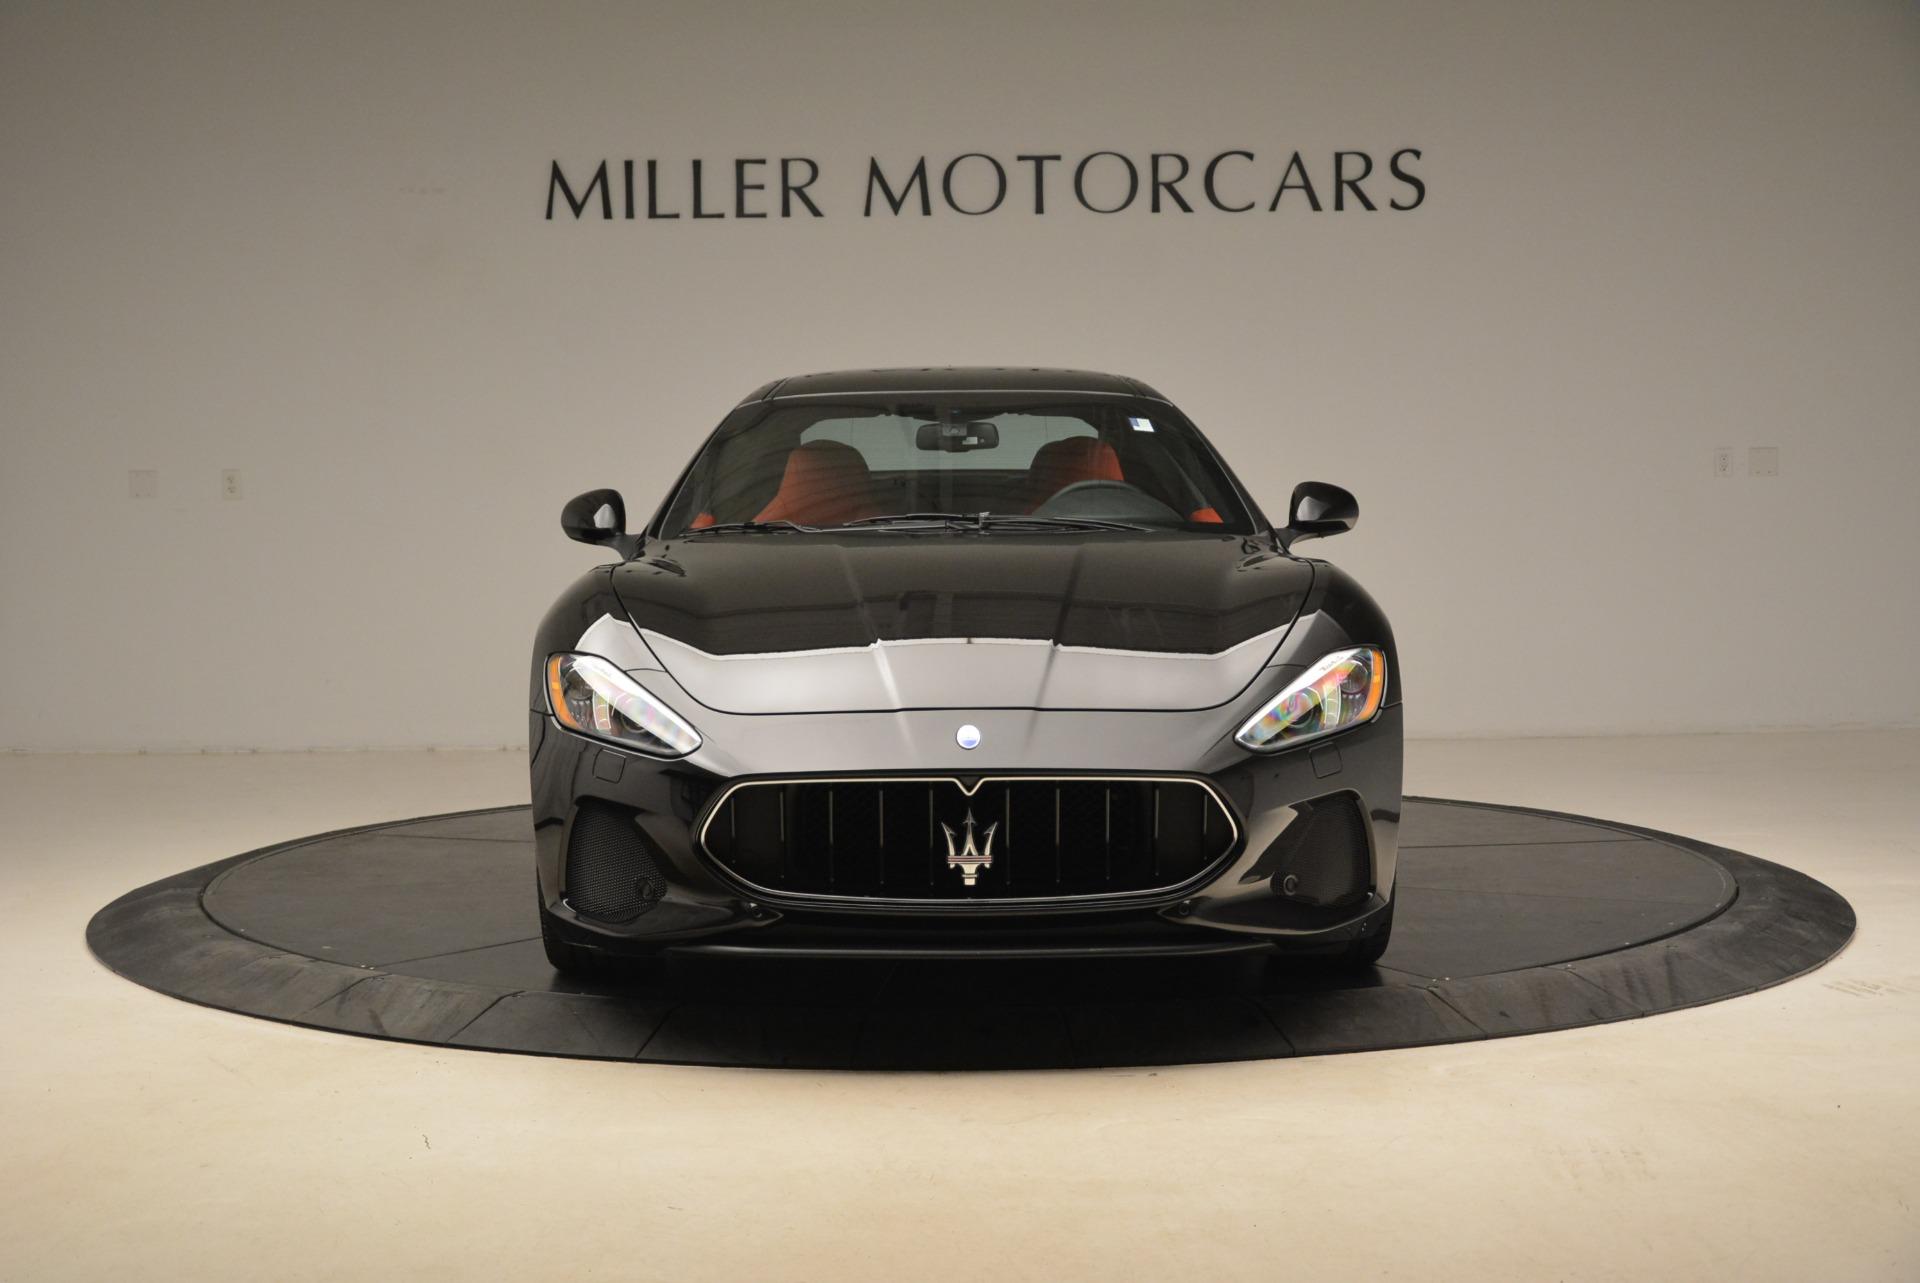 New 2018 Maserati GranTurismo Sport For Sale In Westport, CT 3059_p11